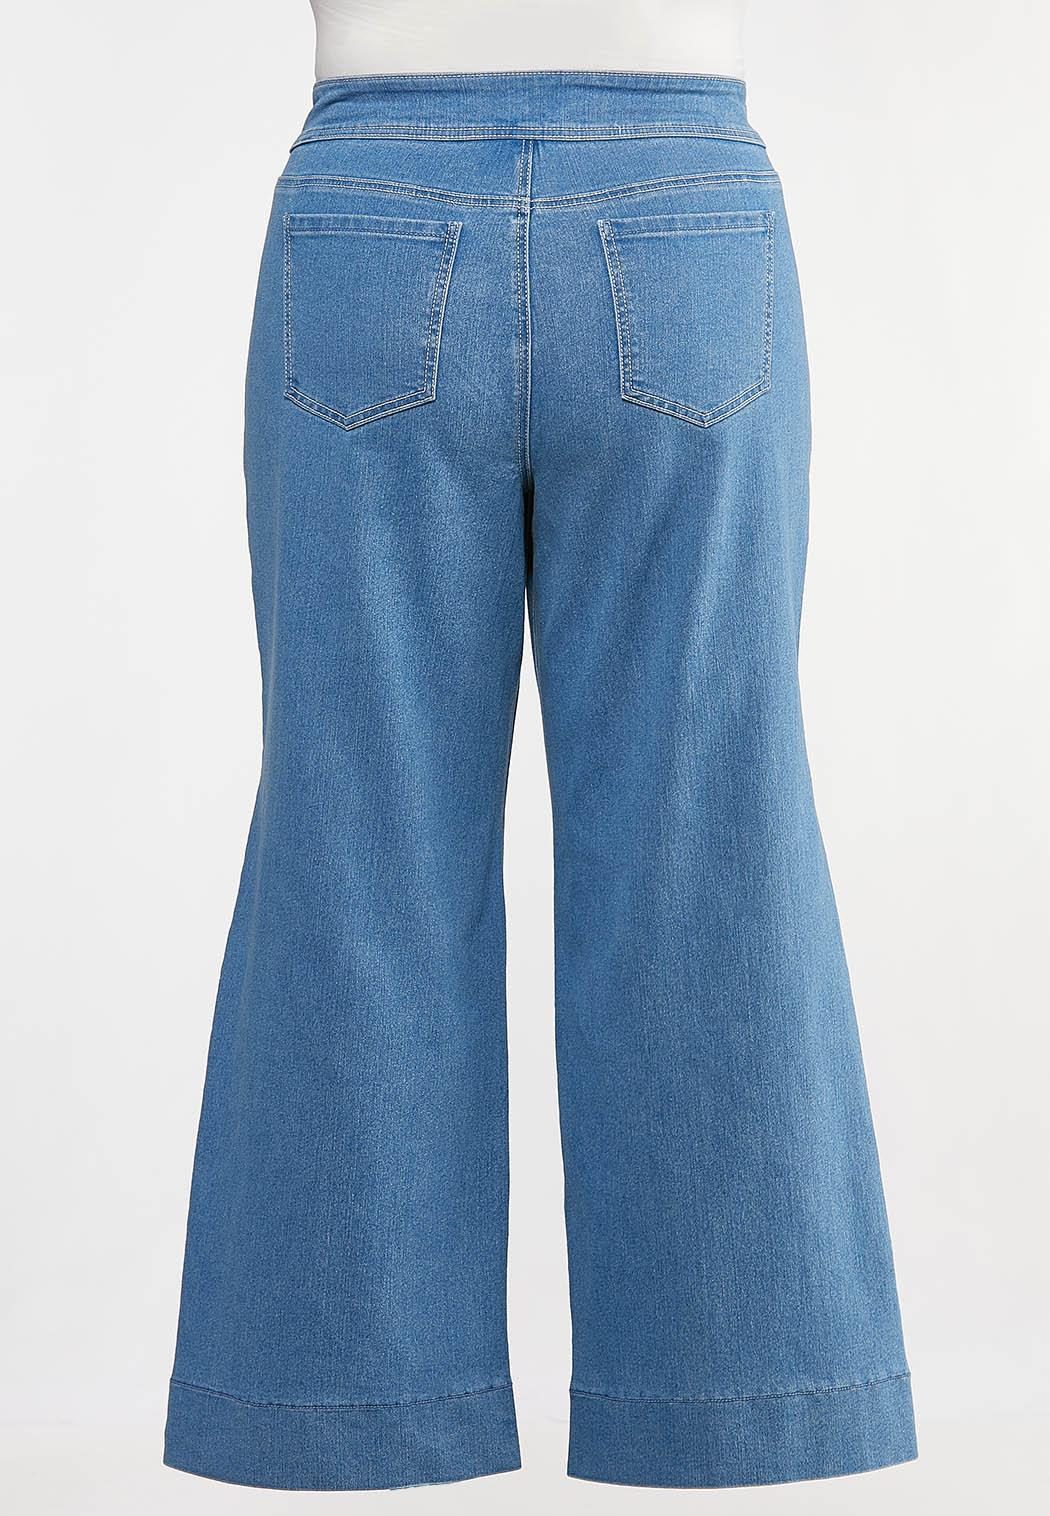 Plus Petite Stitched Trouser Jeans (Item #44156182)